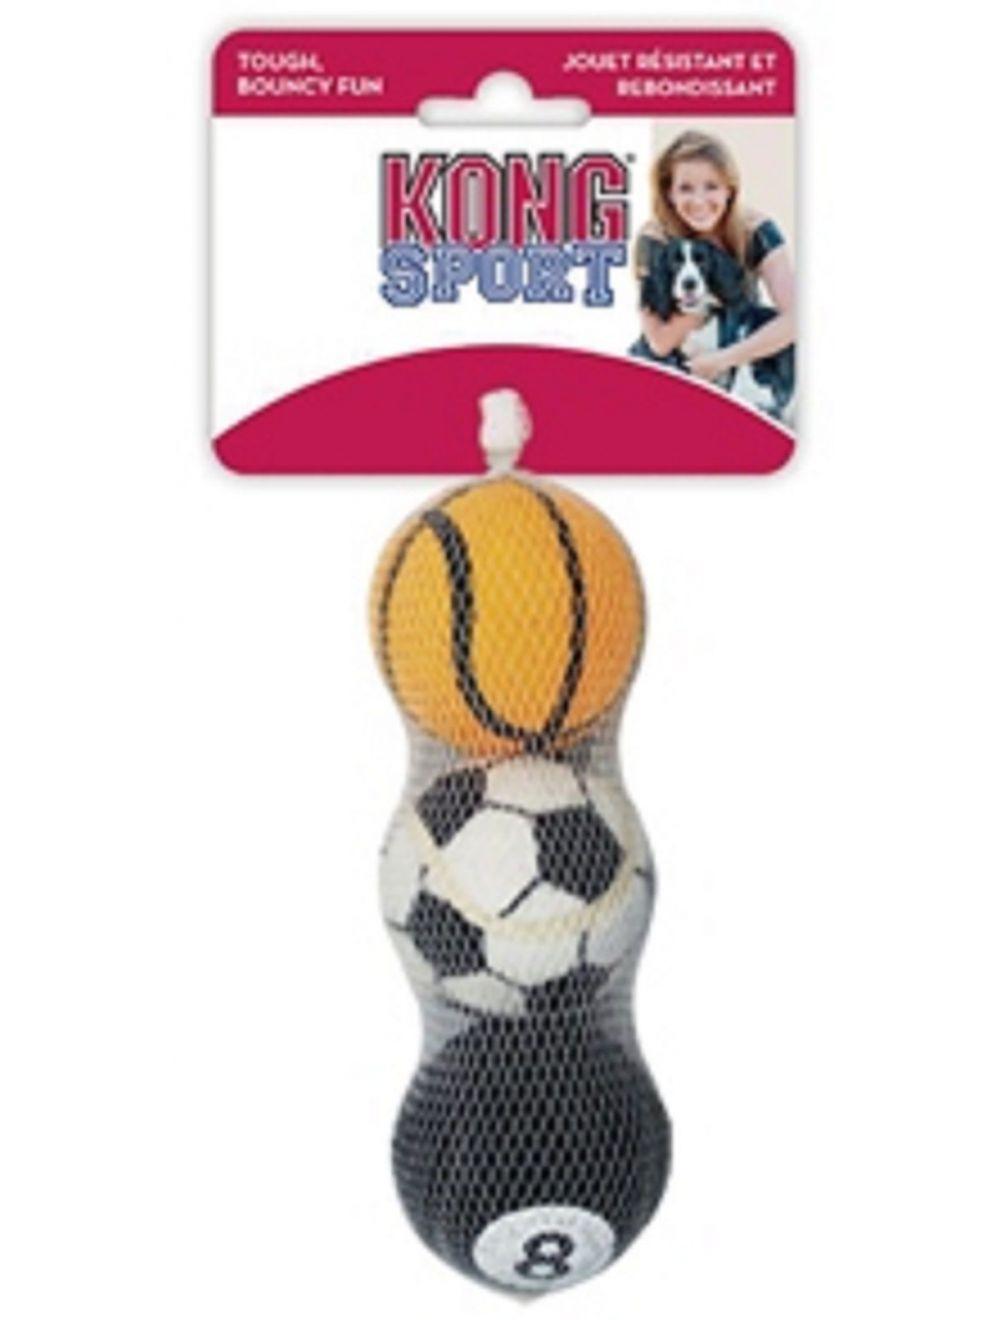 Kong perro sports balls pelota medium x3